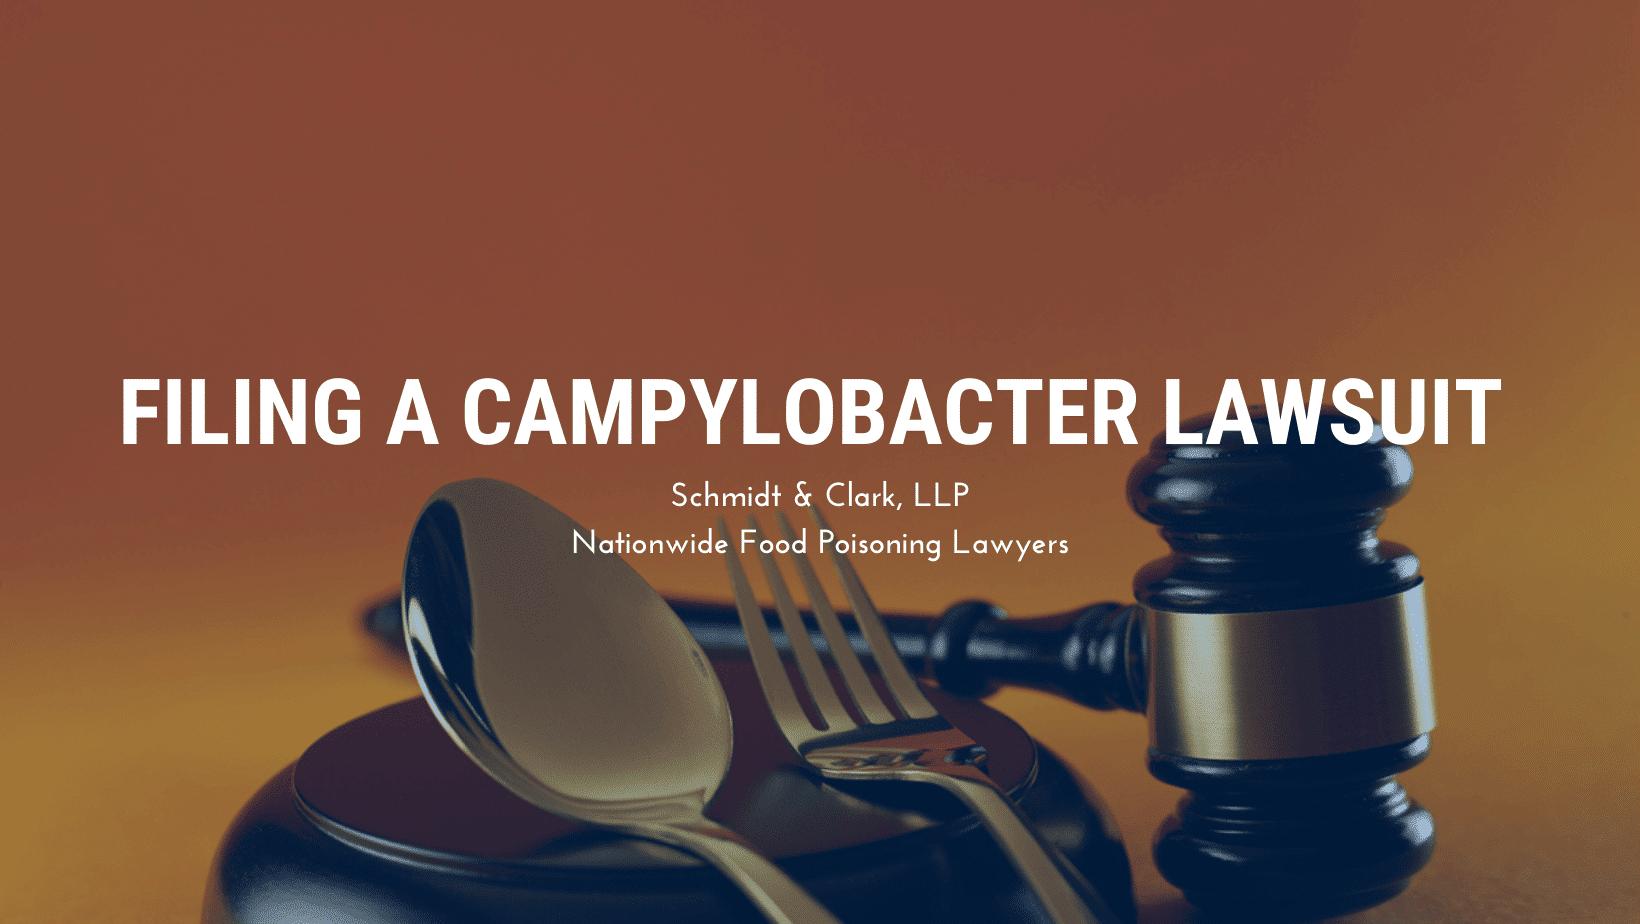 Campylobacter lawsuit